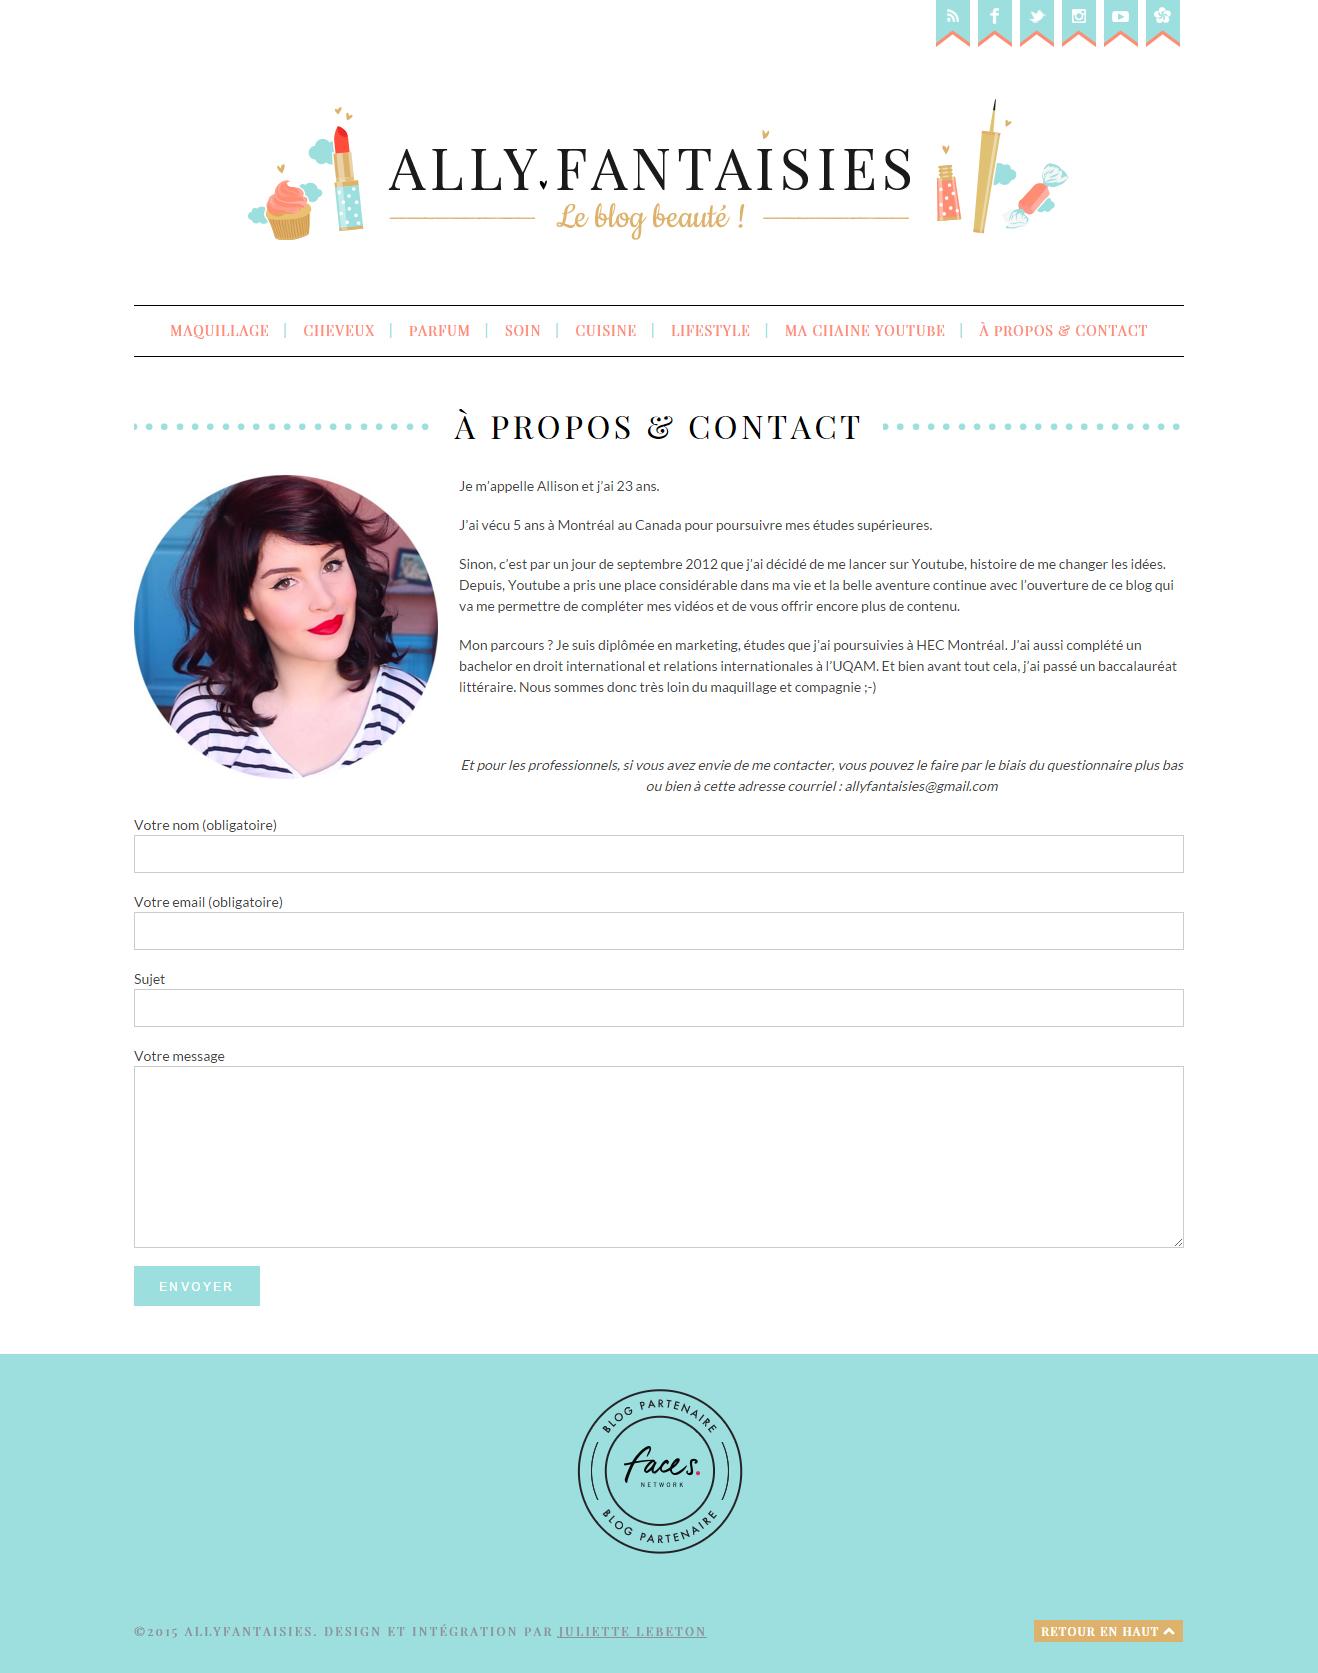 Juliette Lebreton Logo Et Design De Blog Allyfantaisies